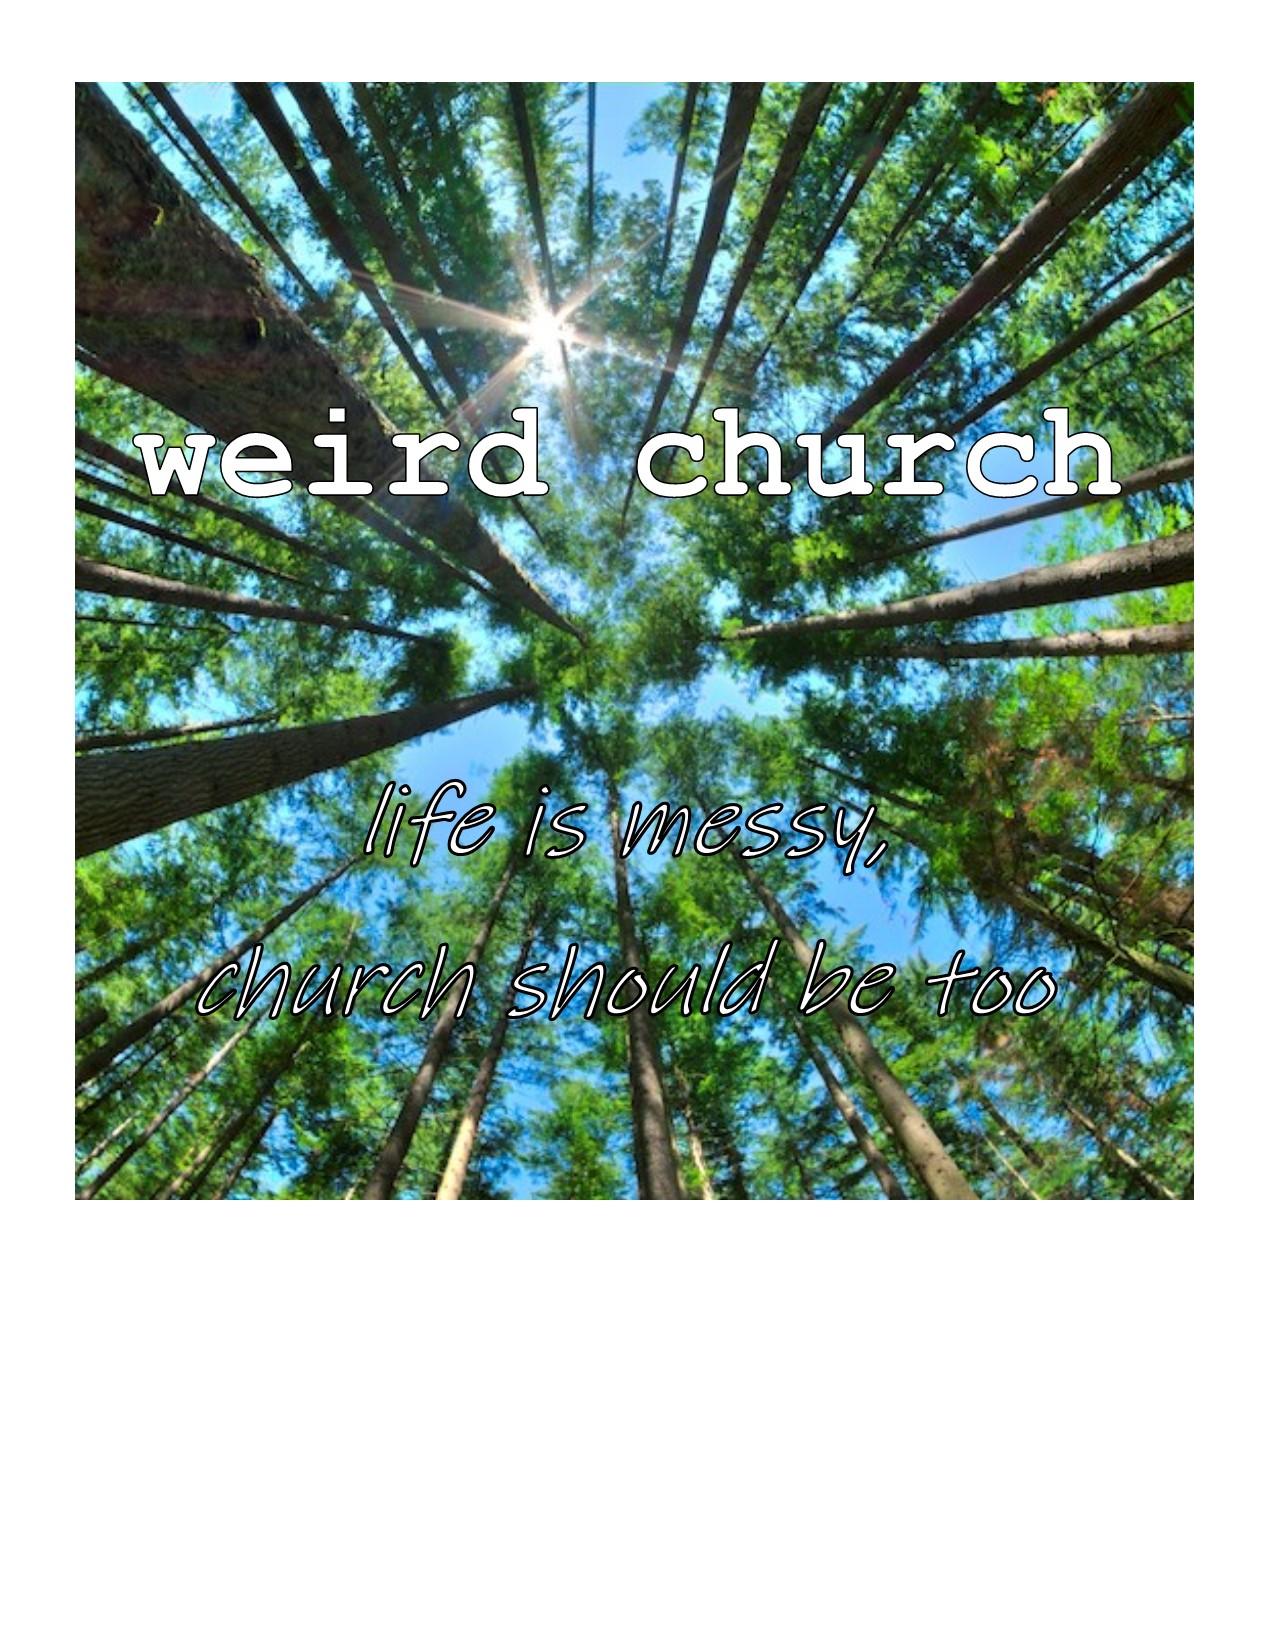 Weird church Facebook profile FAll 2018.jpg